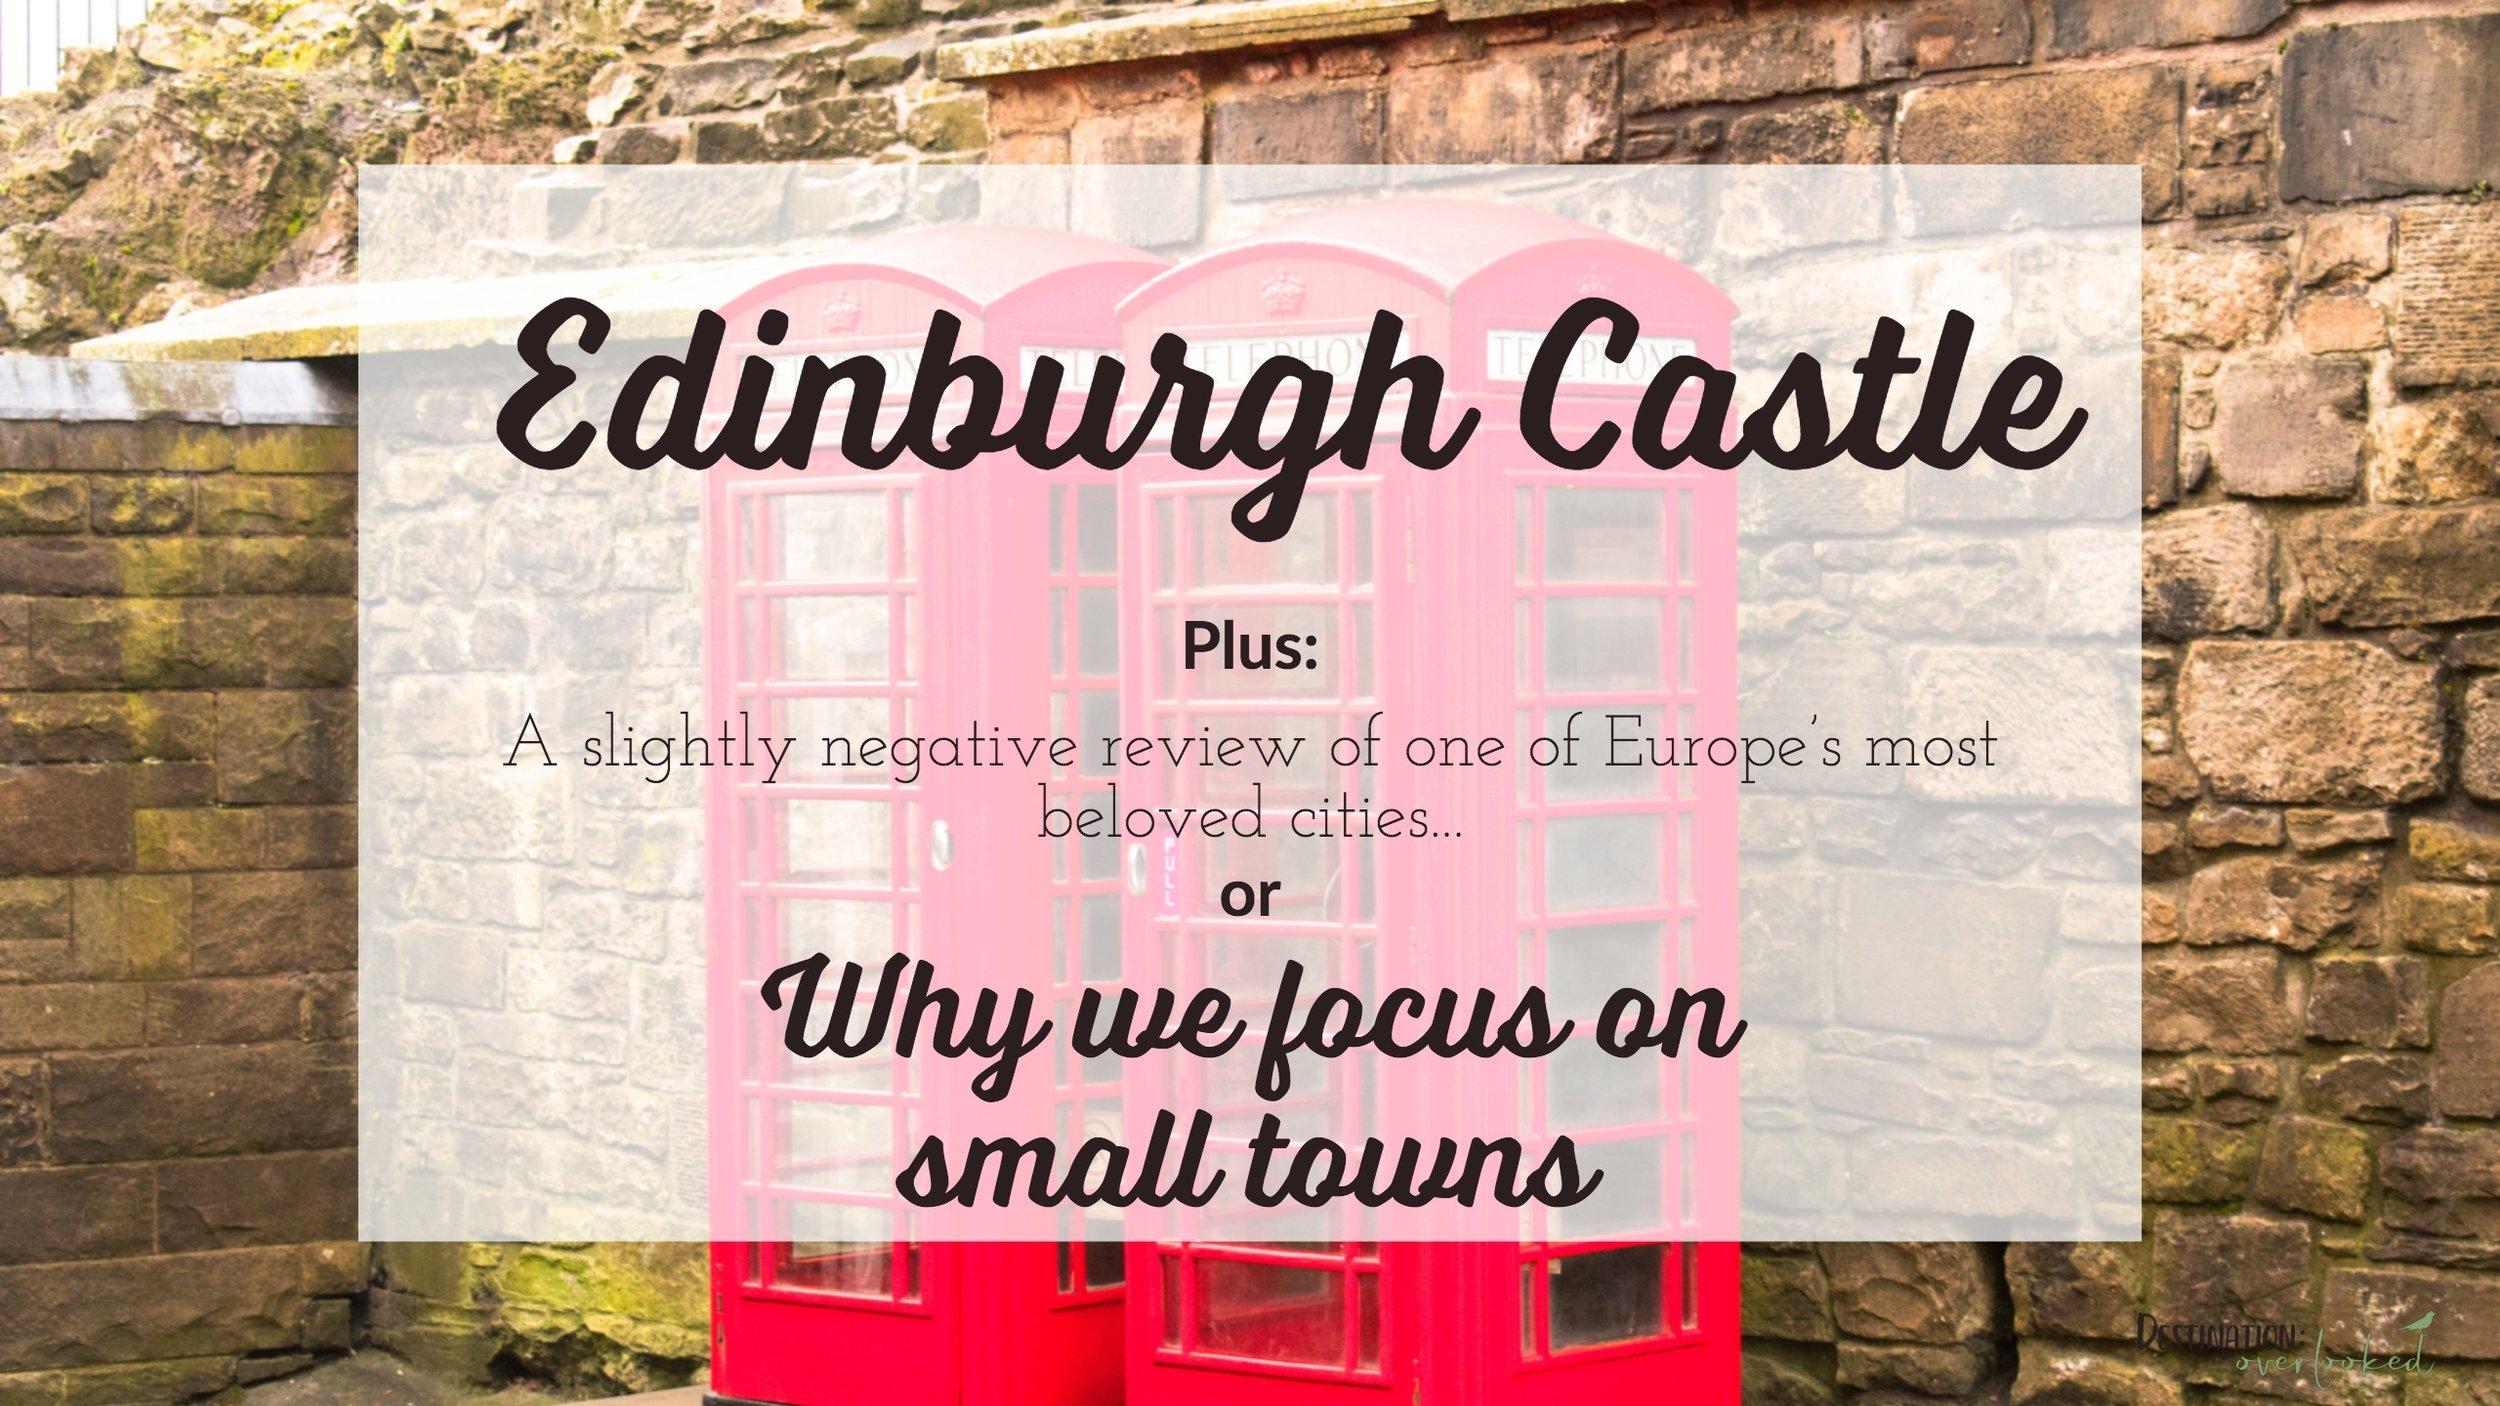 Edinburgh Castle - Plus - Why we focus on small towns